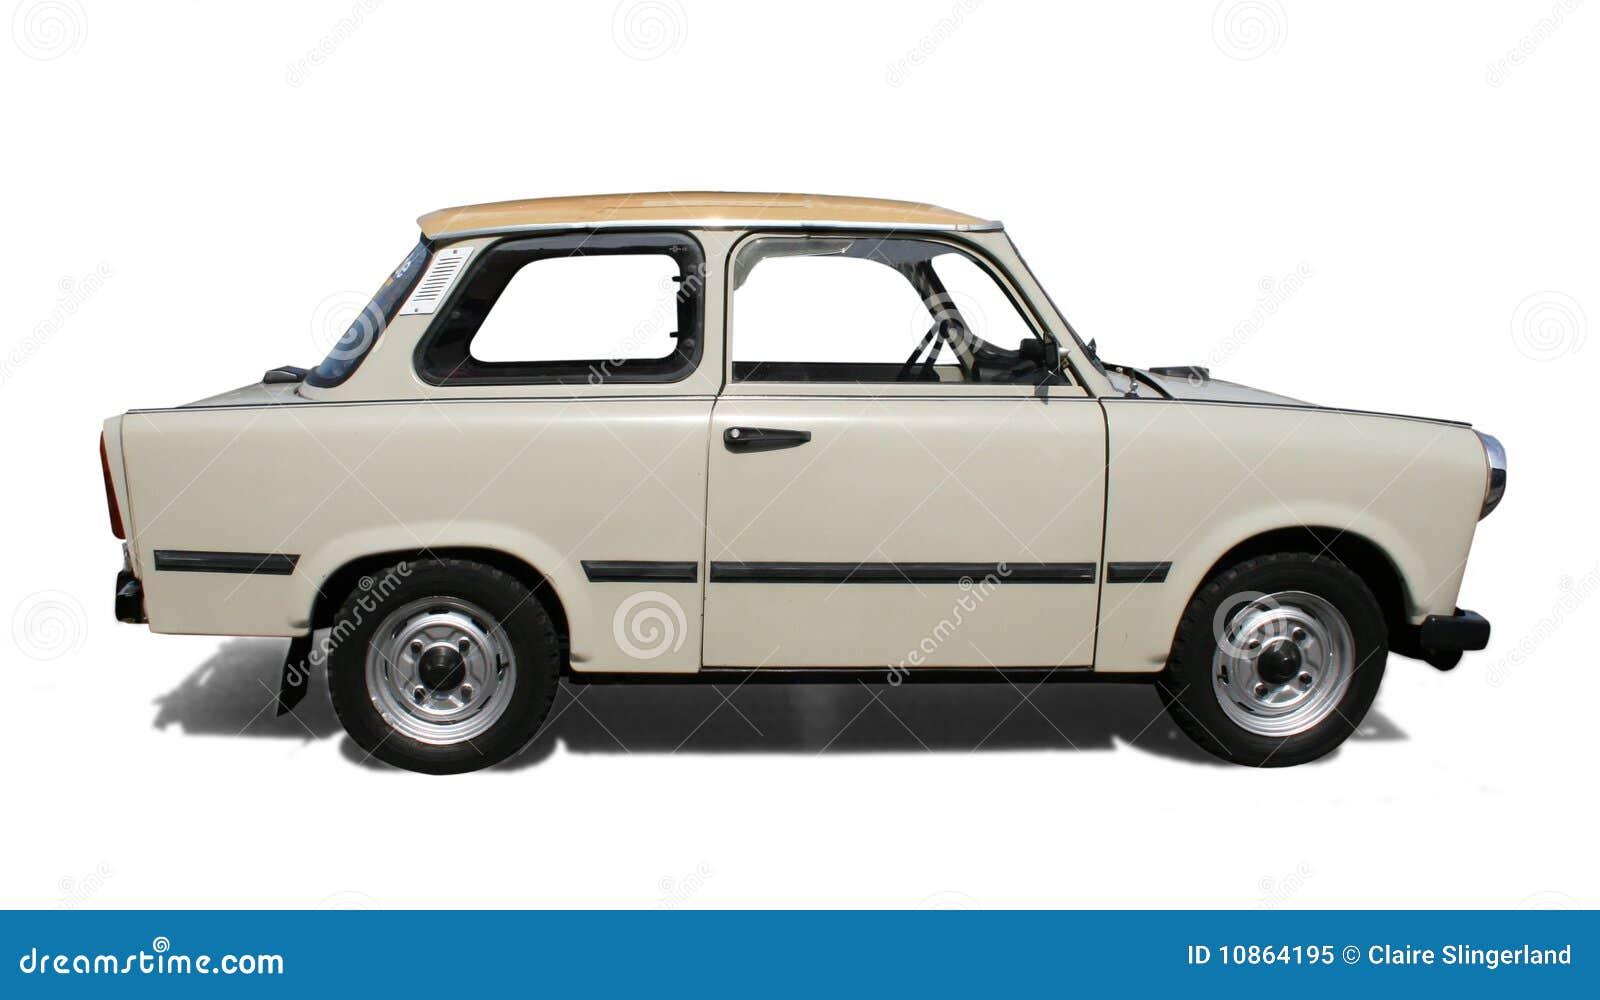 Colorful Old European Cars Model - Classic Cars Ideas - boiq.info